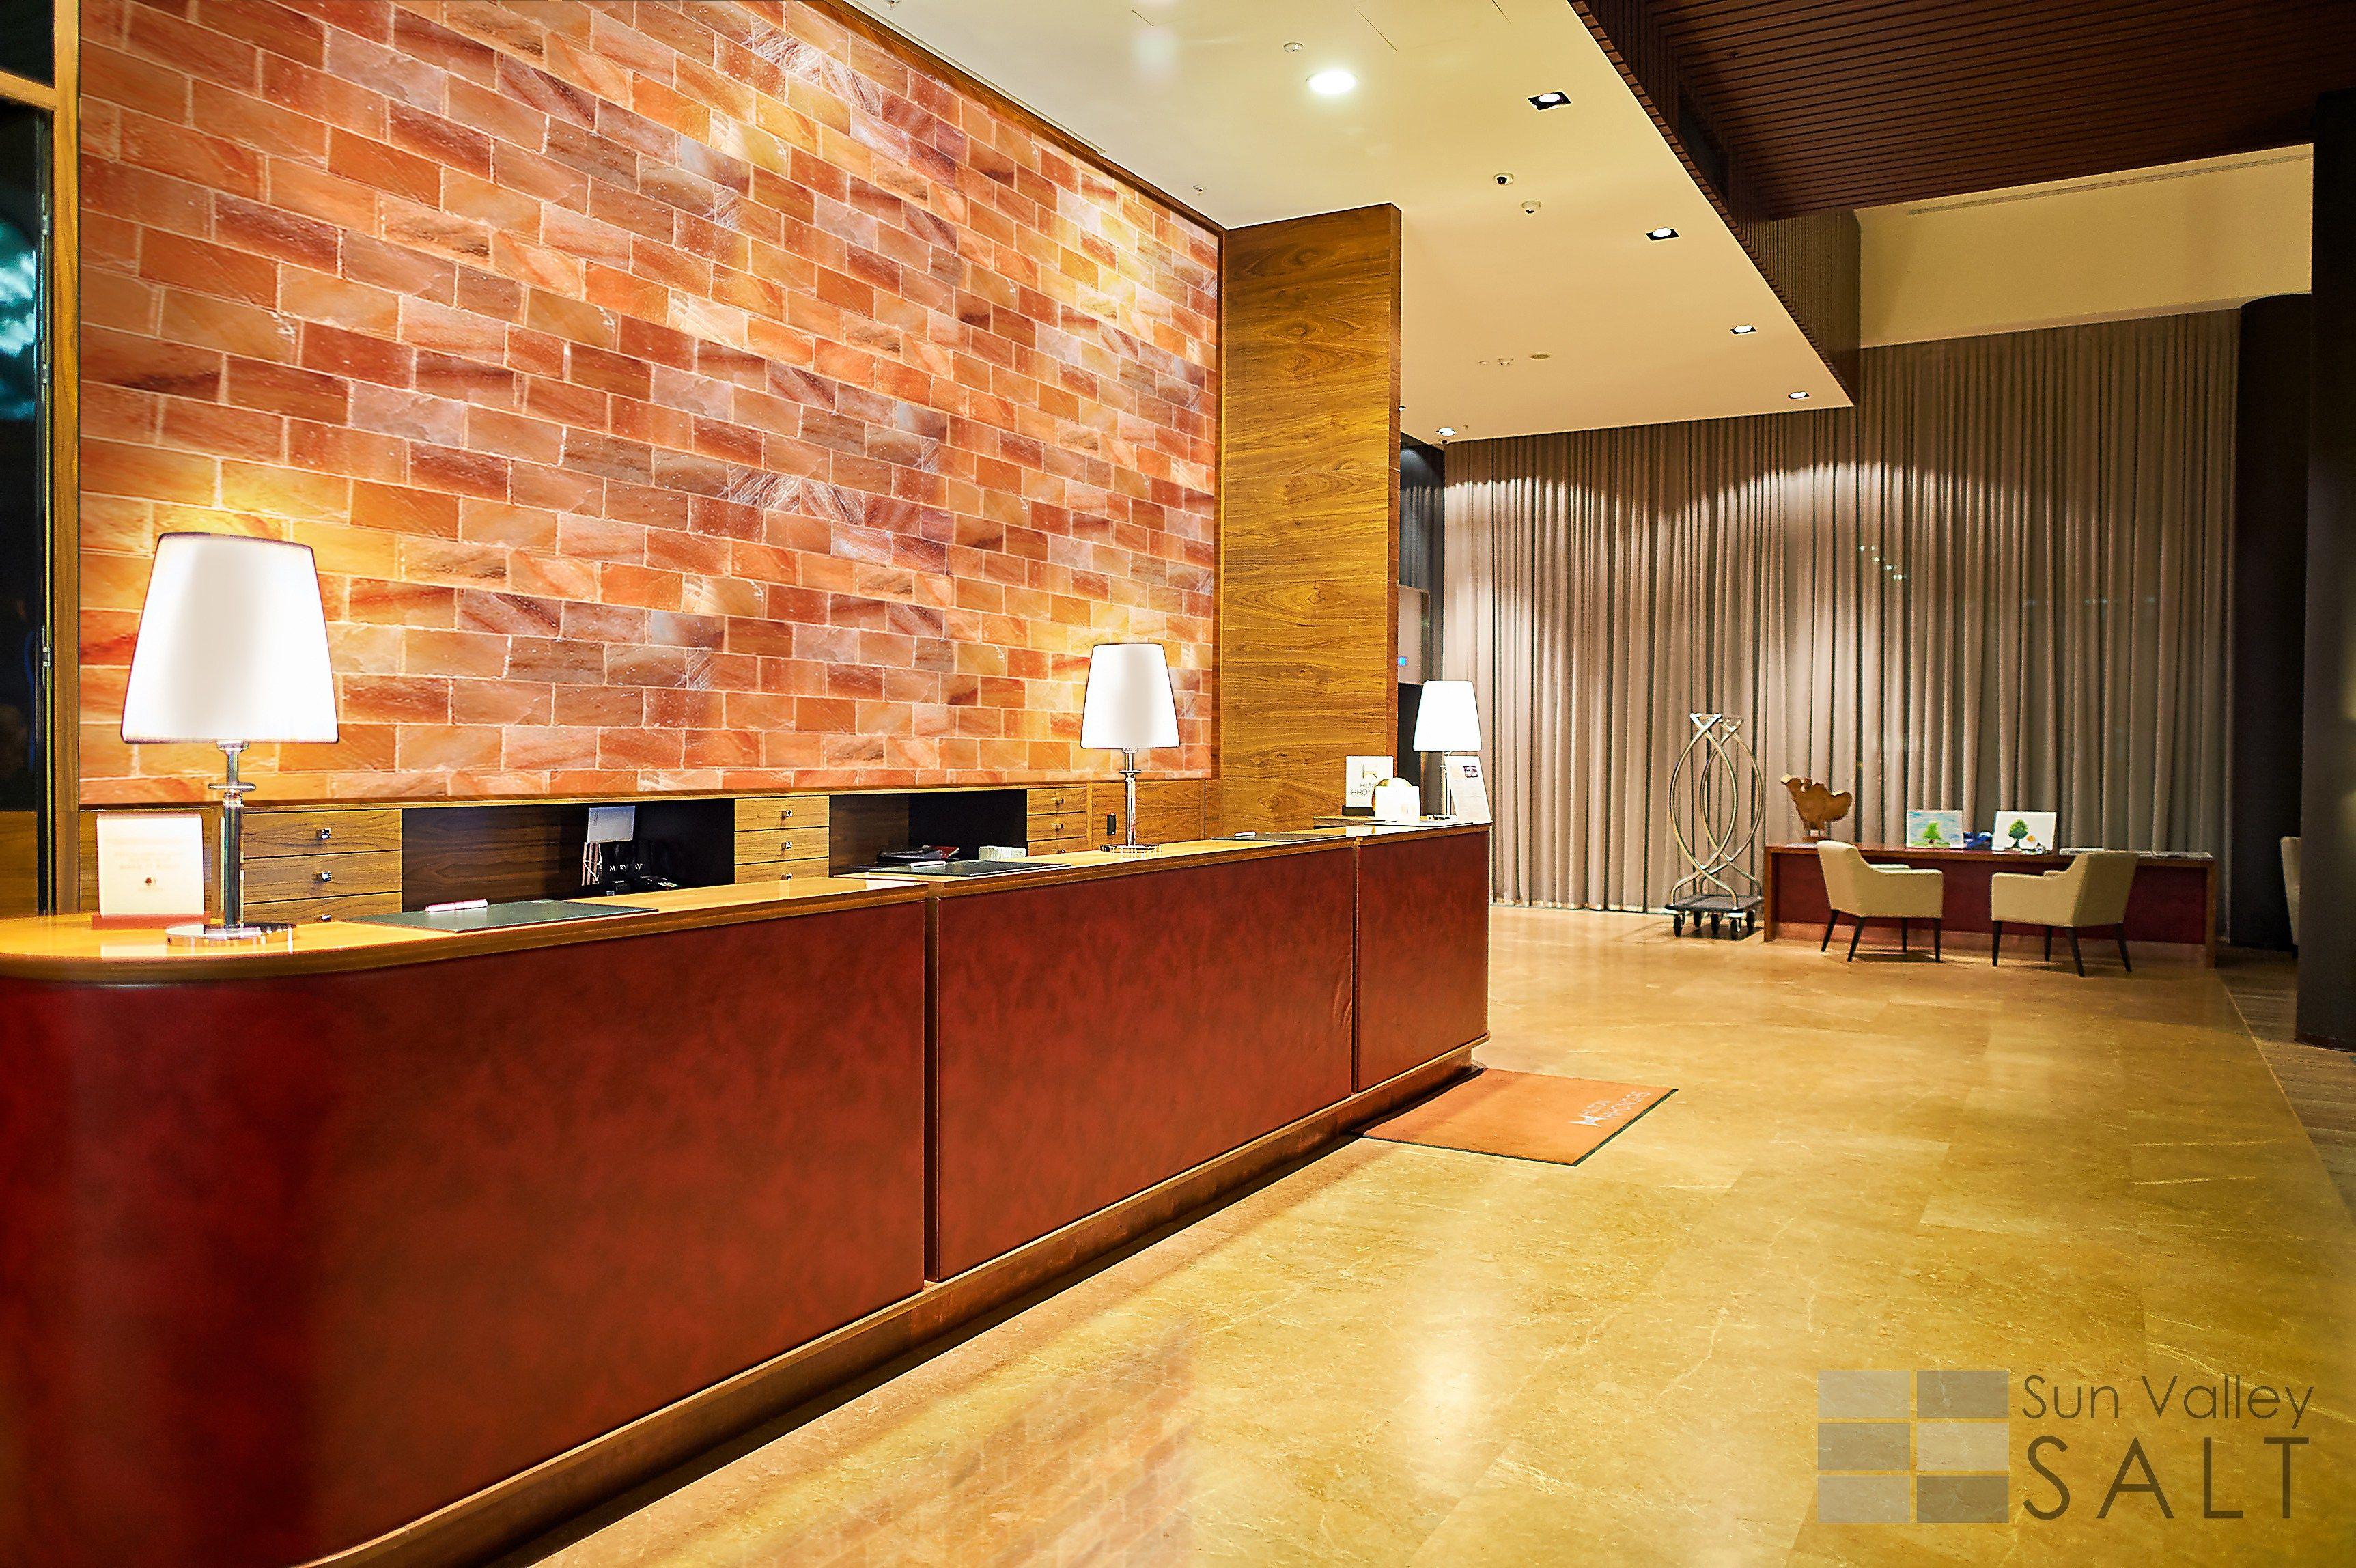 Salt Wall Panels Sun Valley Salt Travel Hotel Health